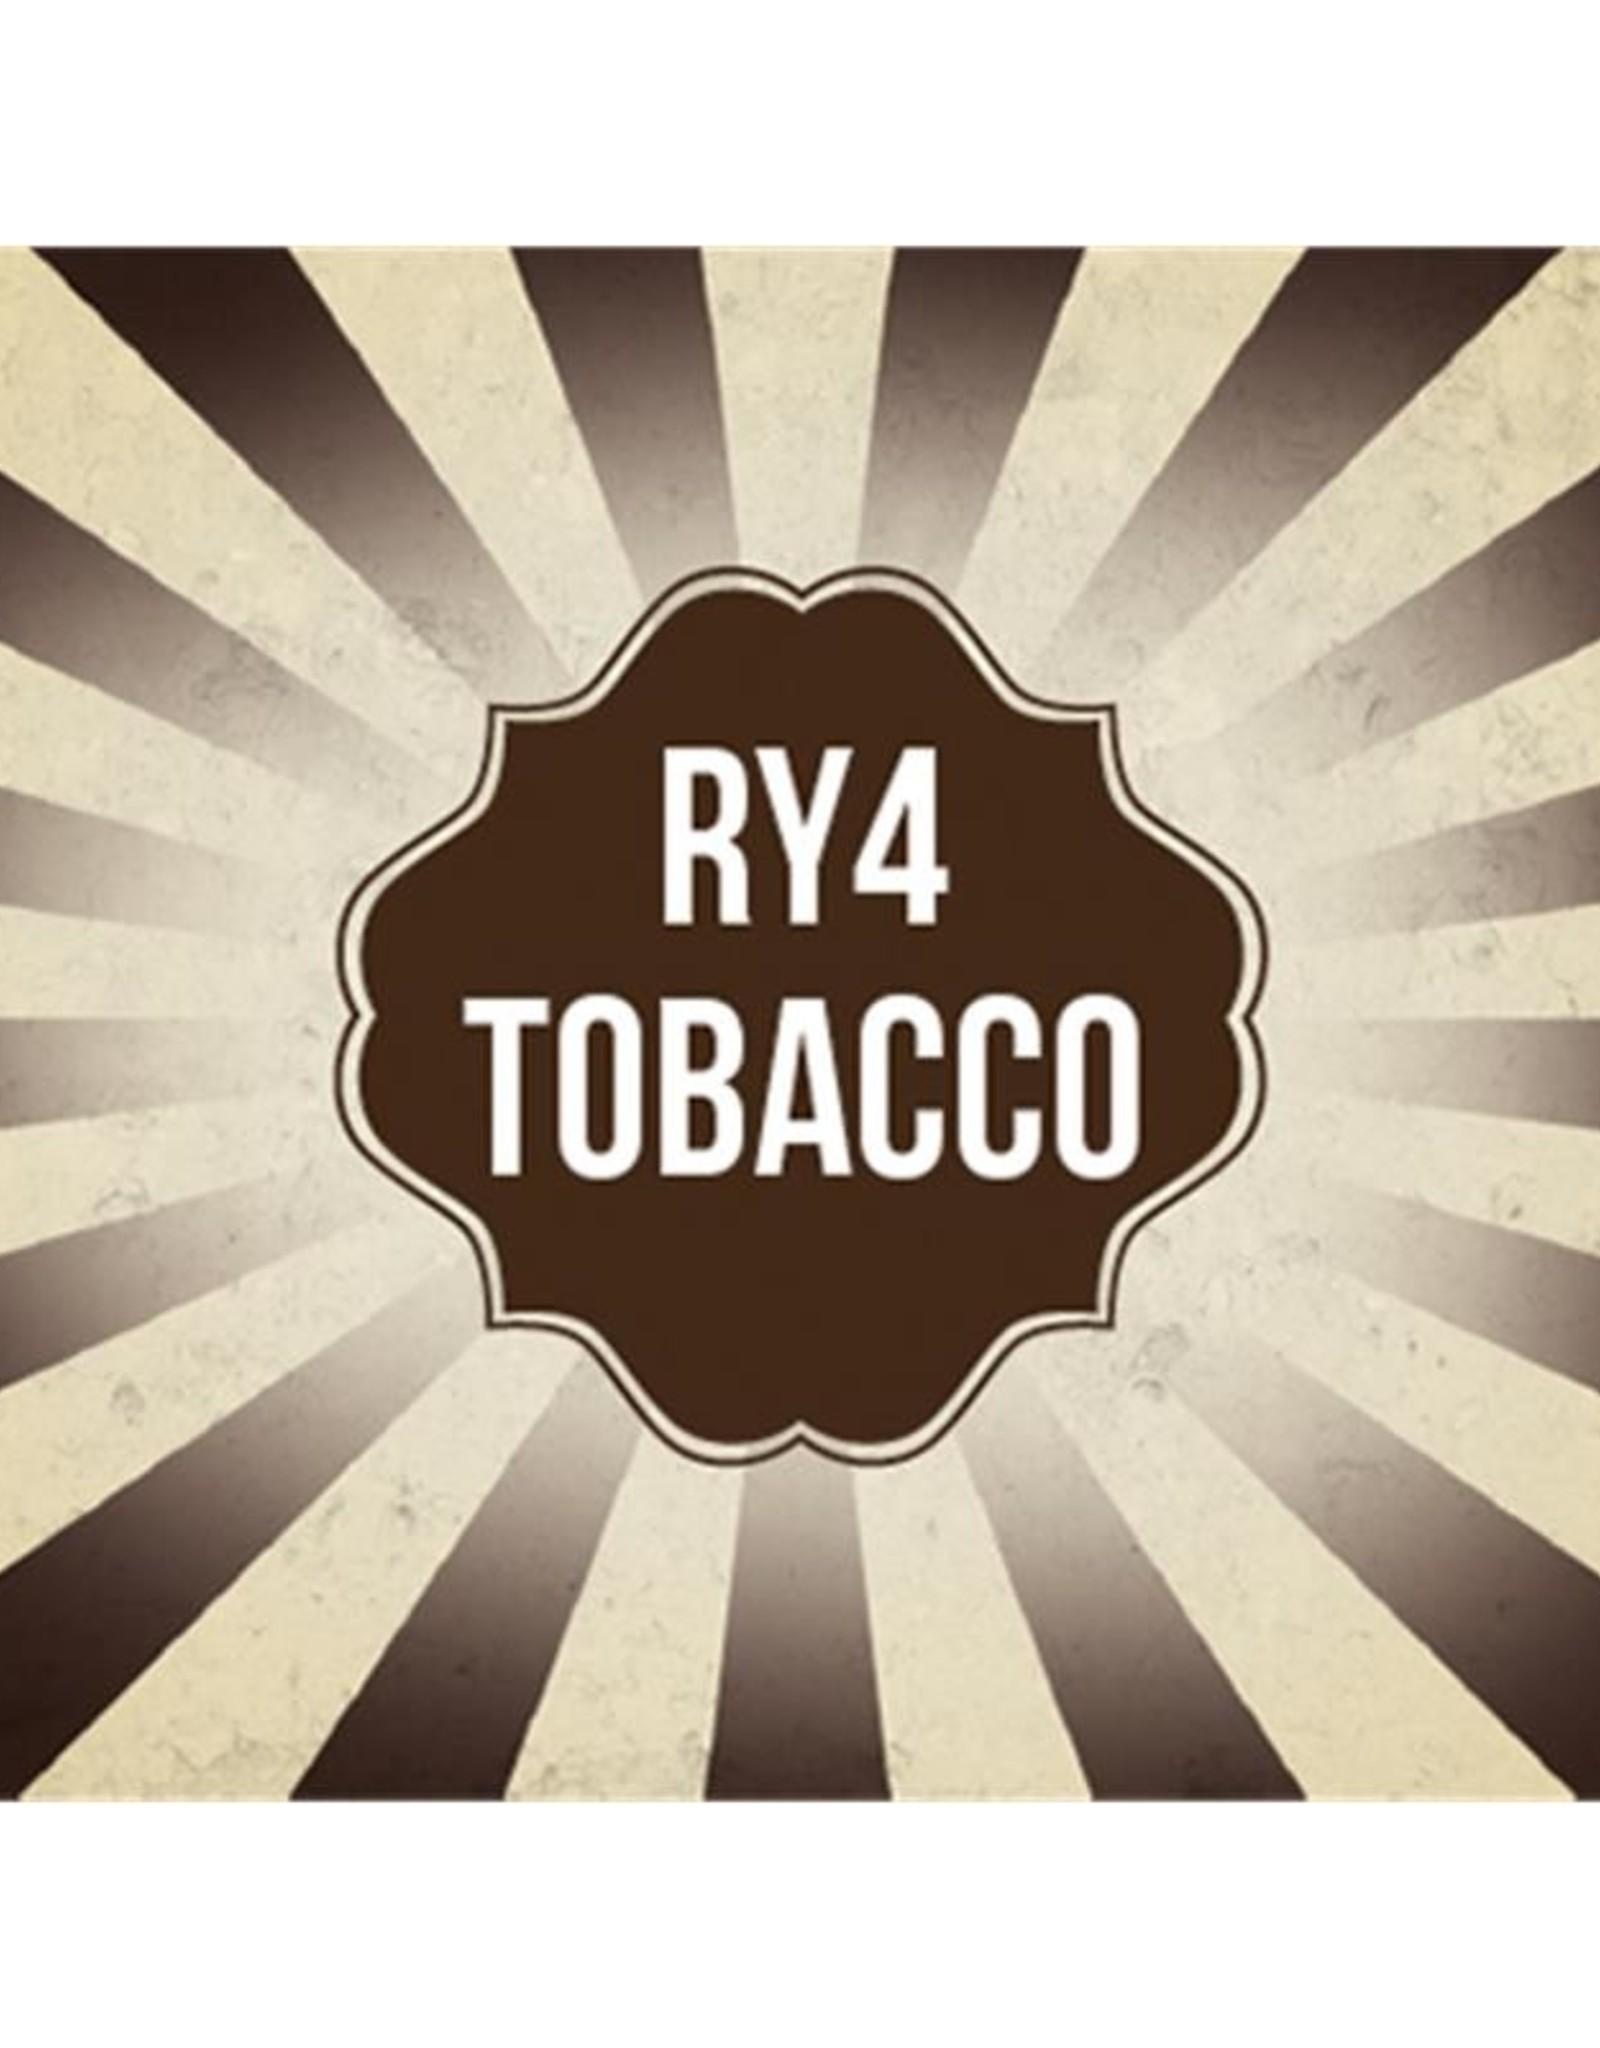 Cirkus Authentic Cirkus RY4 Tobacco 12 mg Nicotine